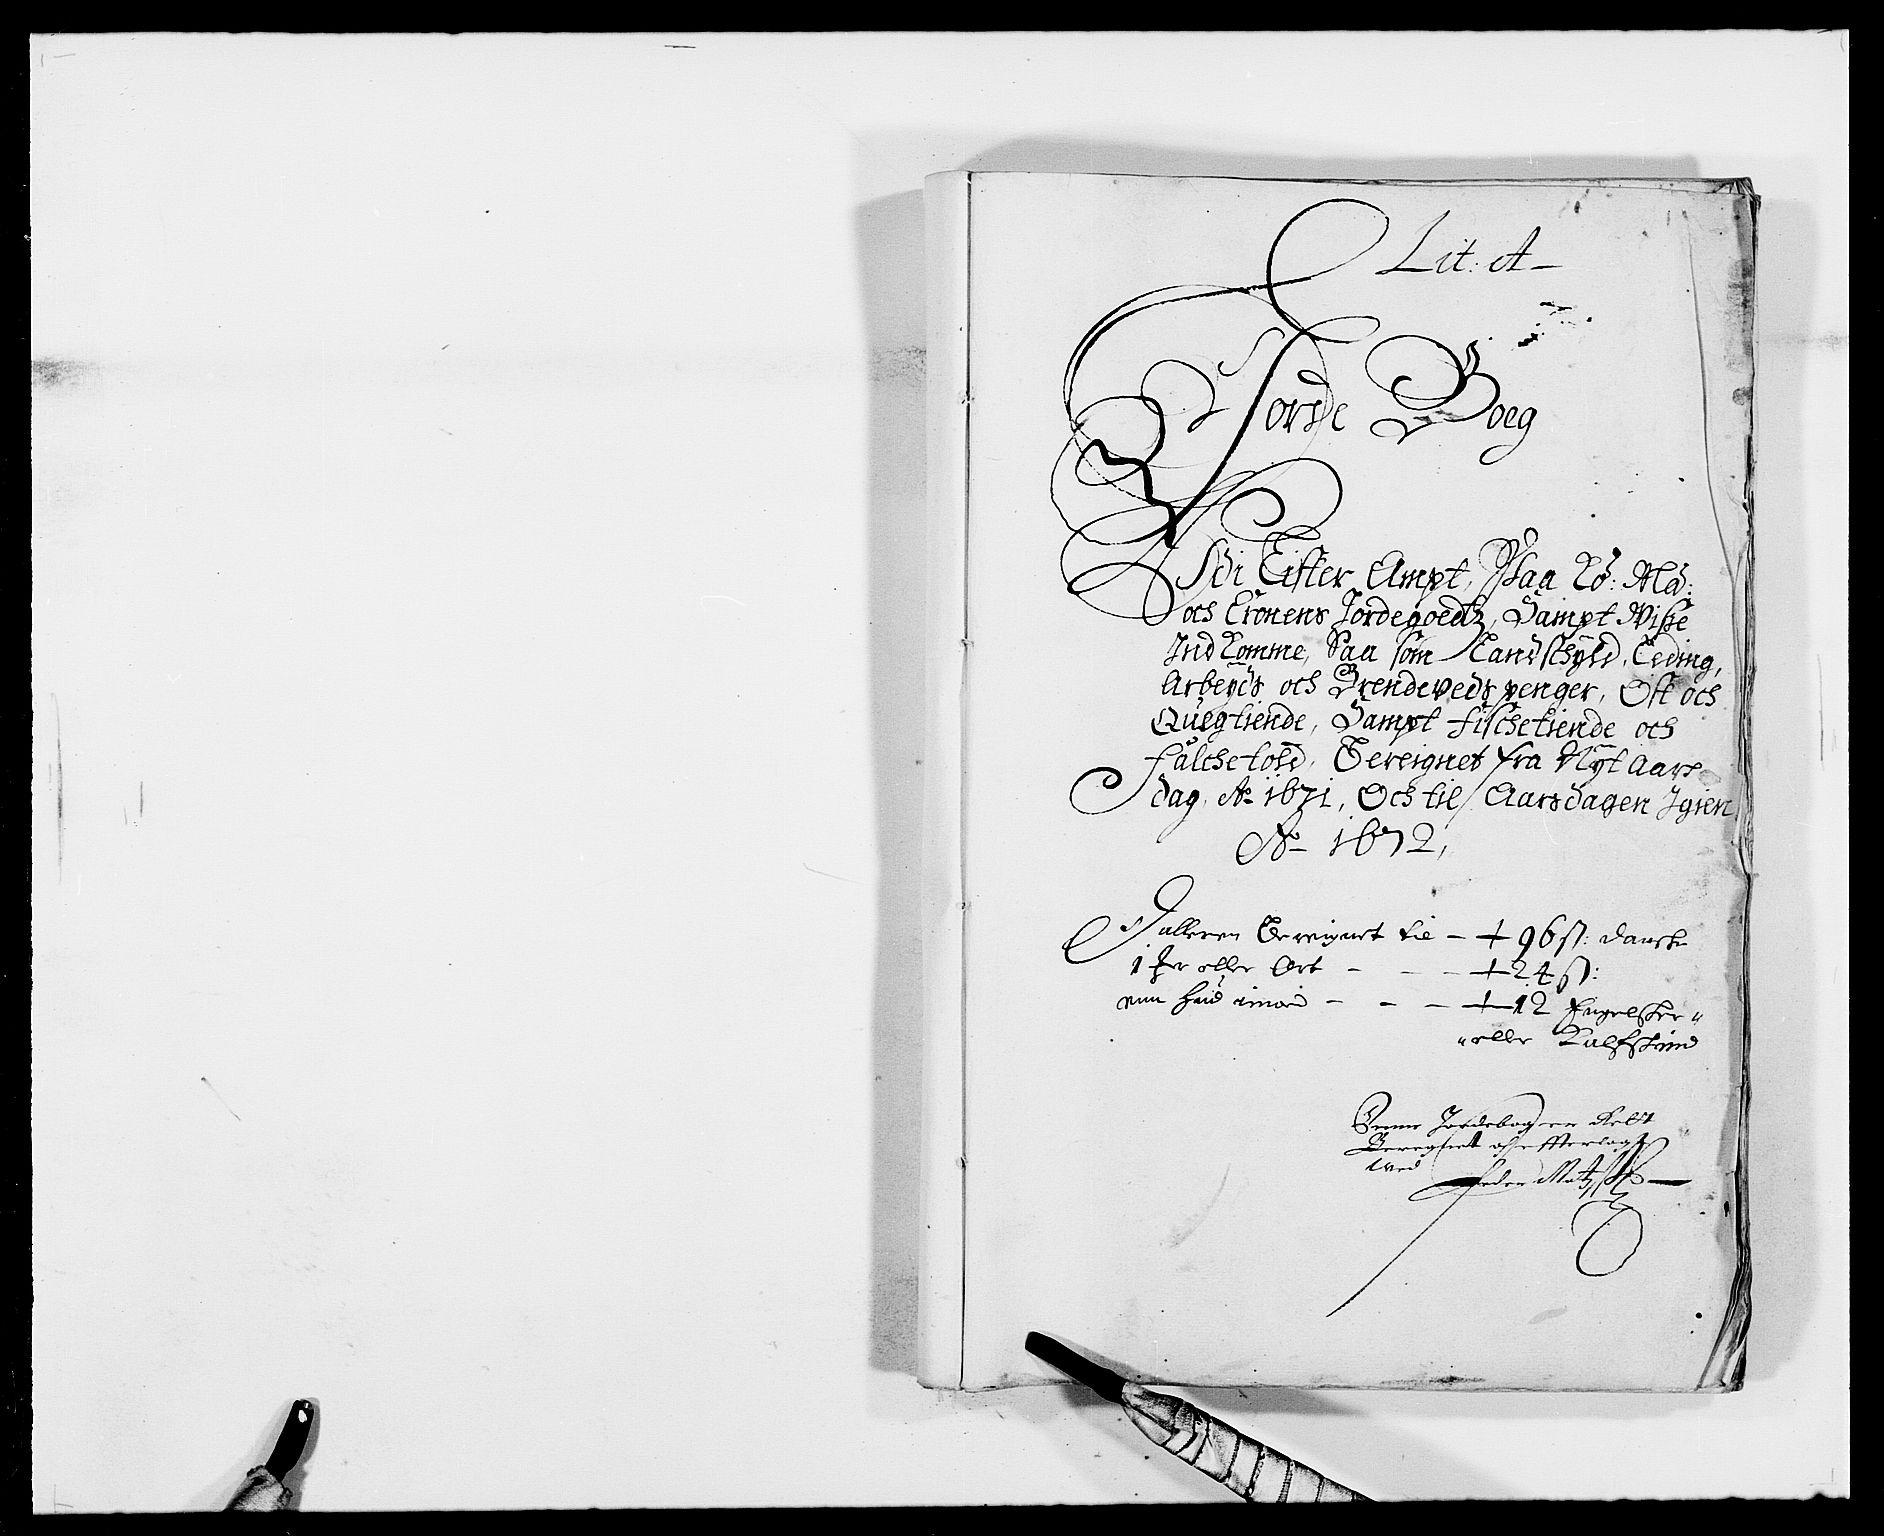 RA, Rentekammeret inntil 1814, Reviderte regnskaper, Fogderegnskap, R41/L2525: Fogderegnskap Lista, 1669-1671, s. 153